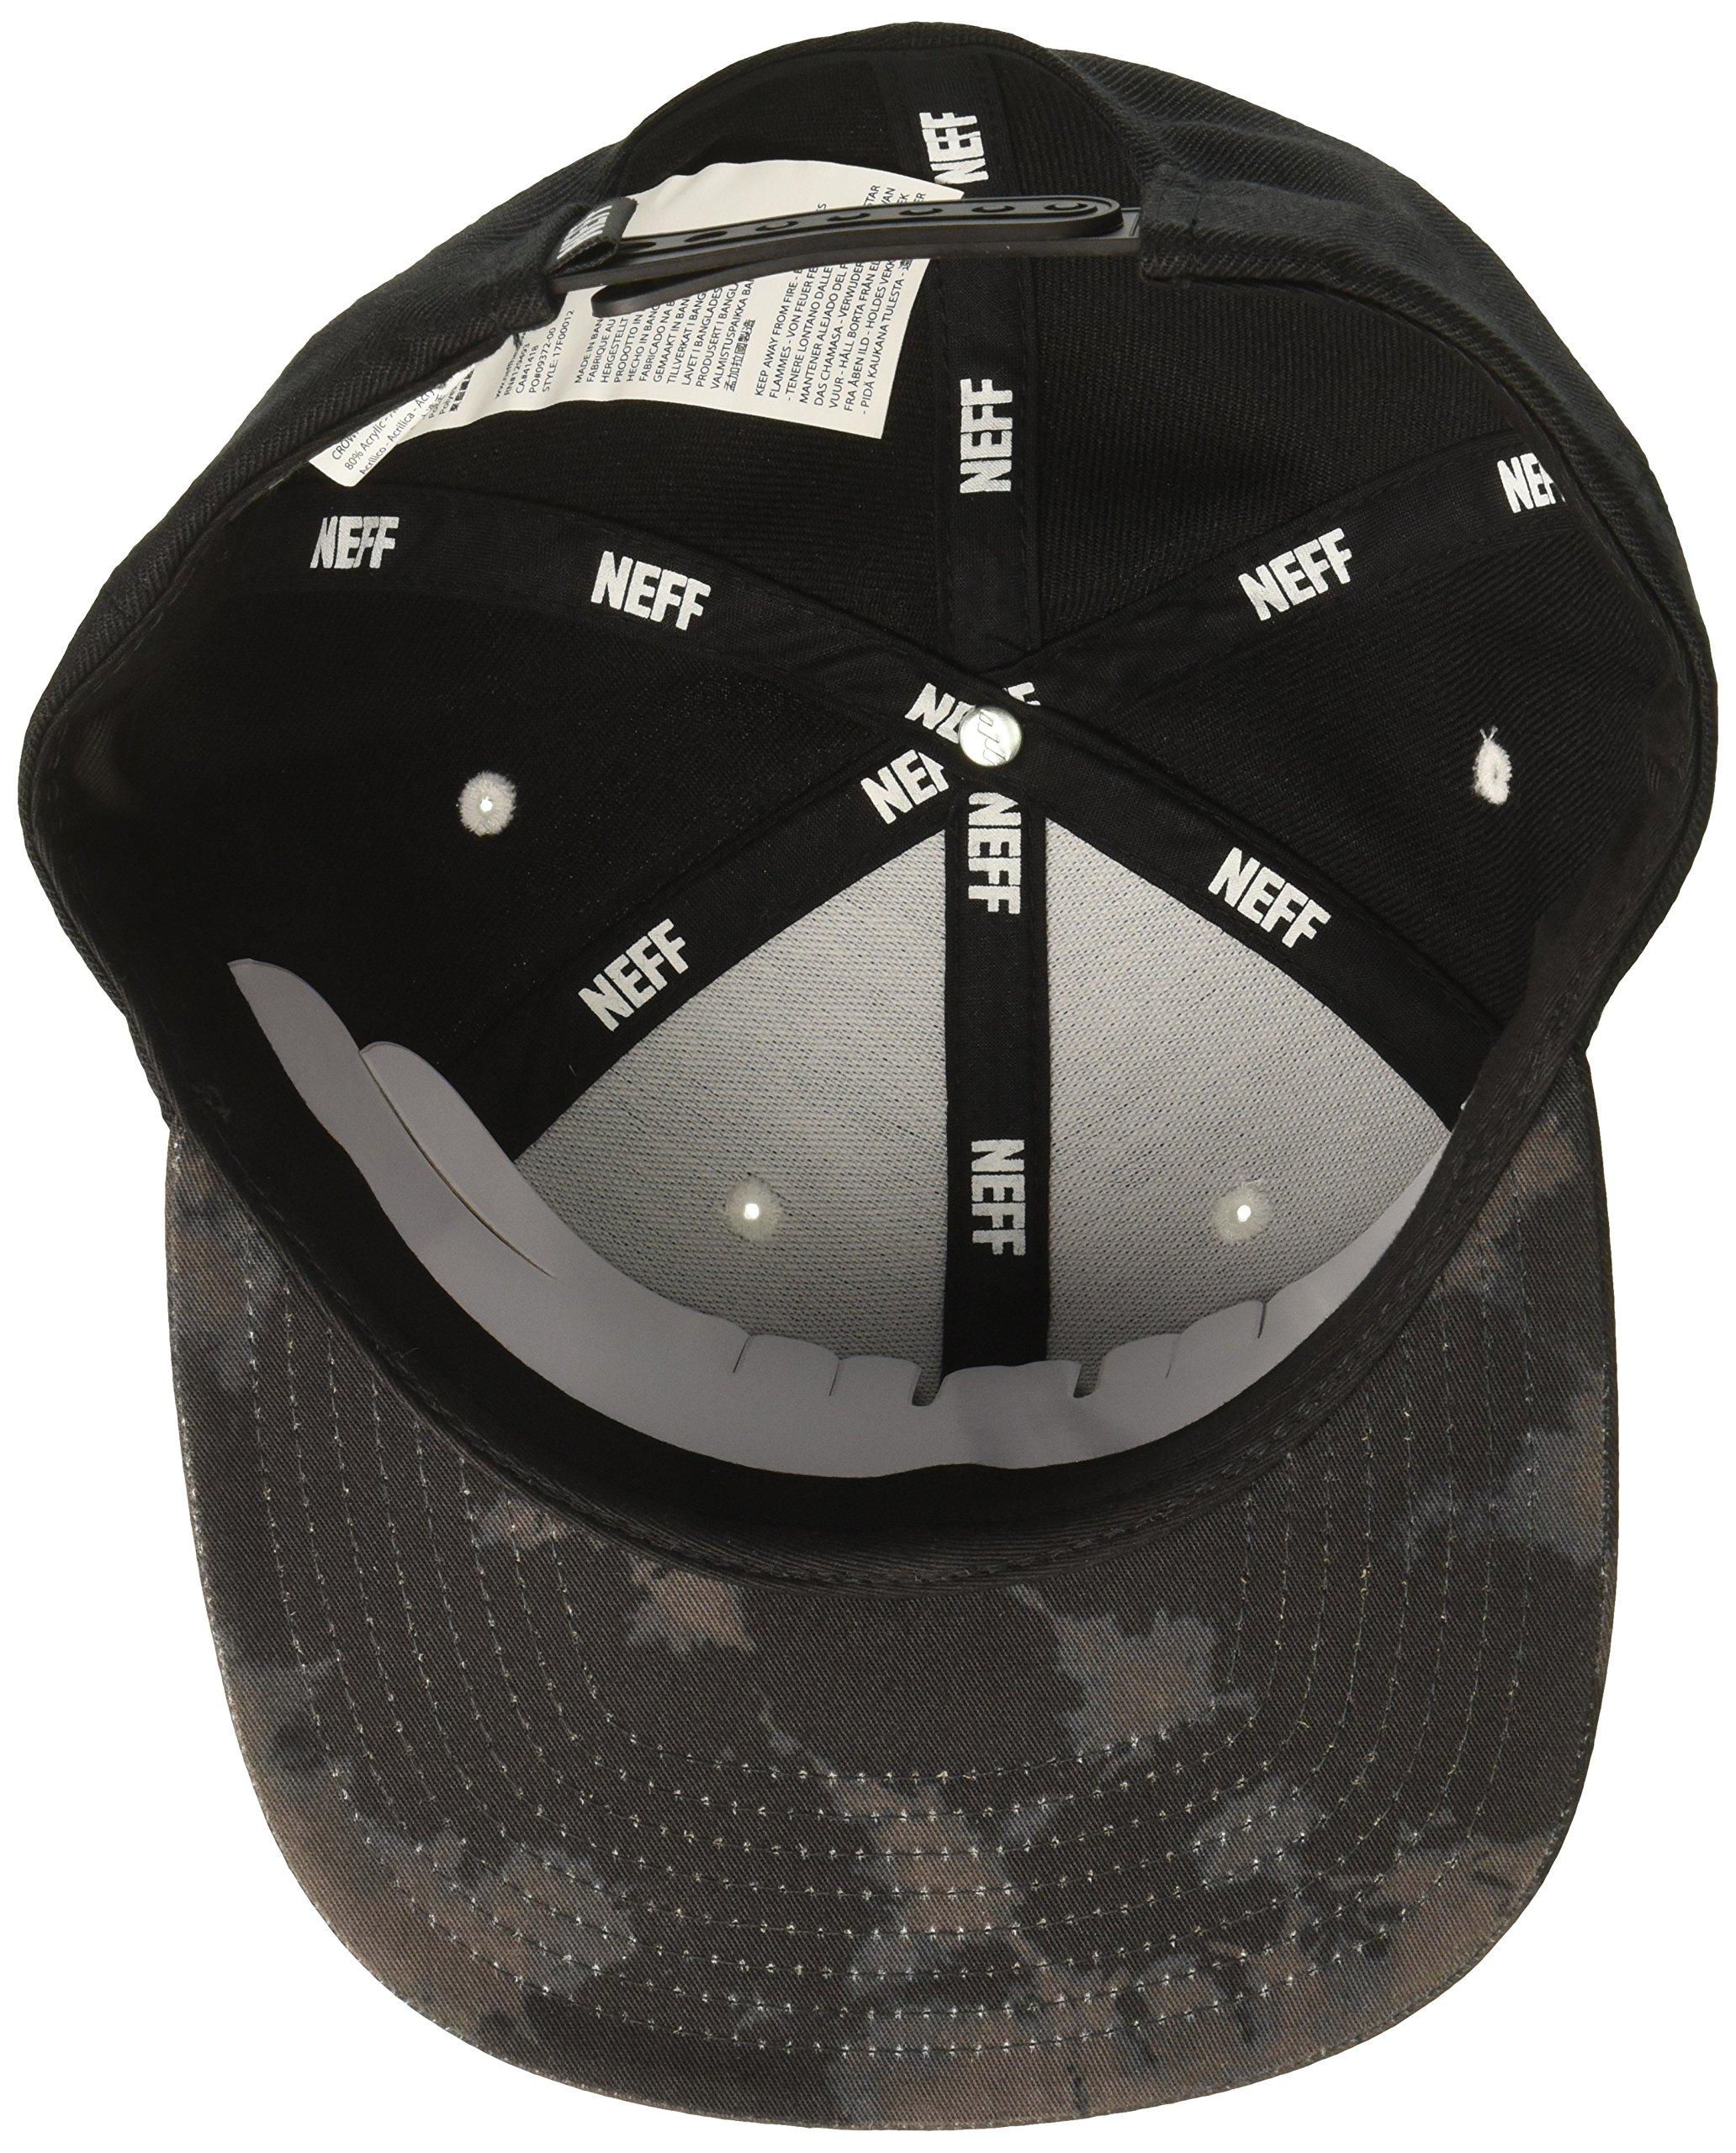 NEFF Men's Daily Cap, Black Wash, One Size by NEFF (Image #3)